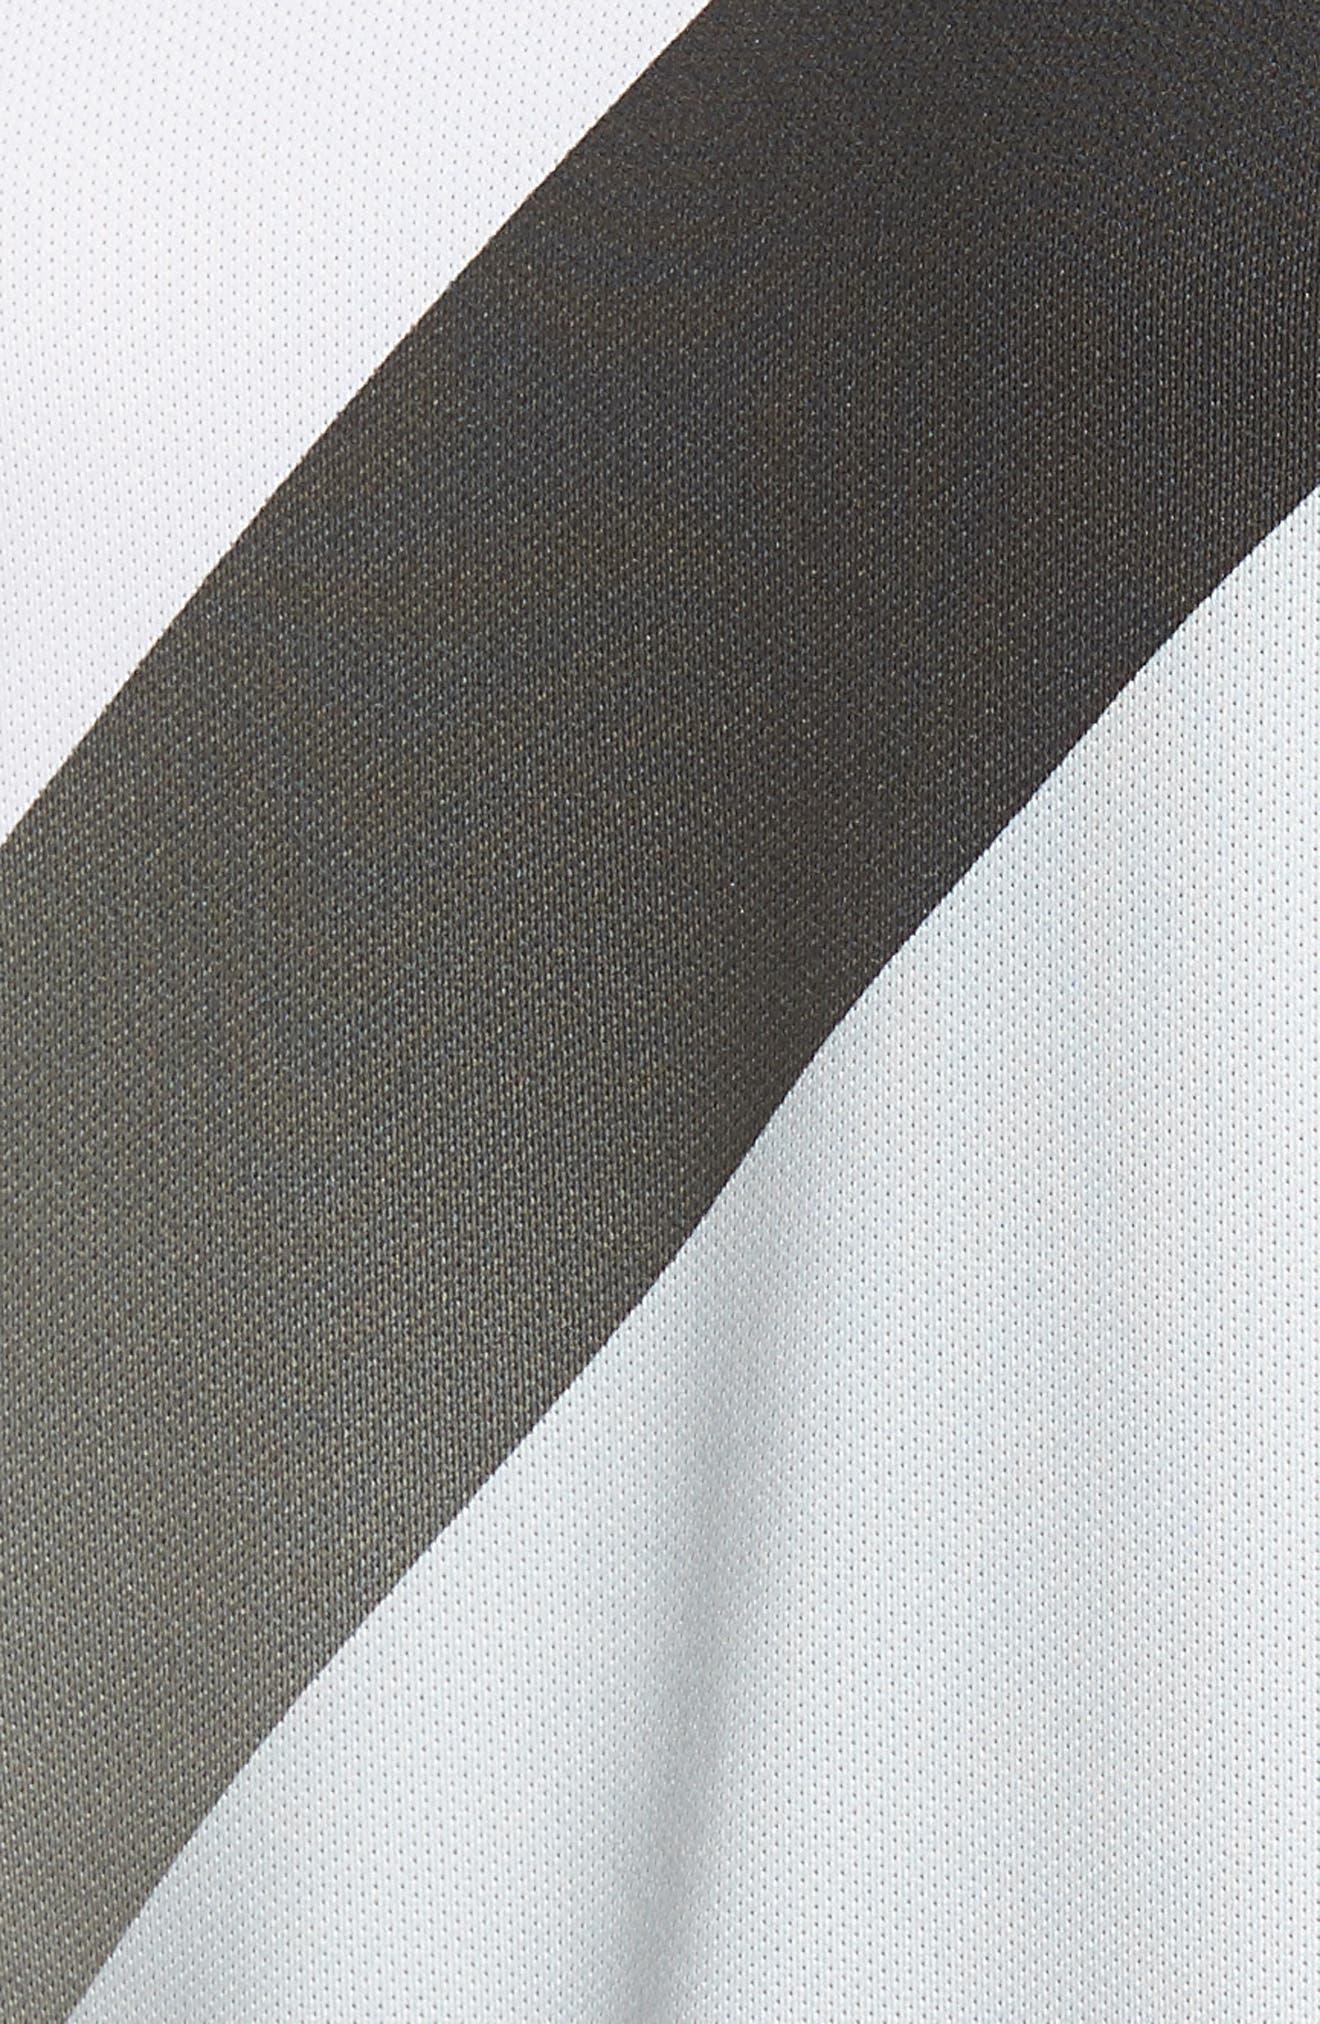 Dry Golf Polo,                             Alternate thumbnail 5, color,                             White/ Platinum/ Black/ Black